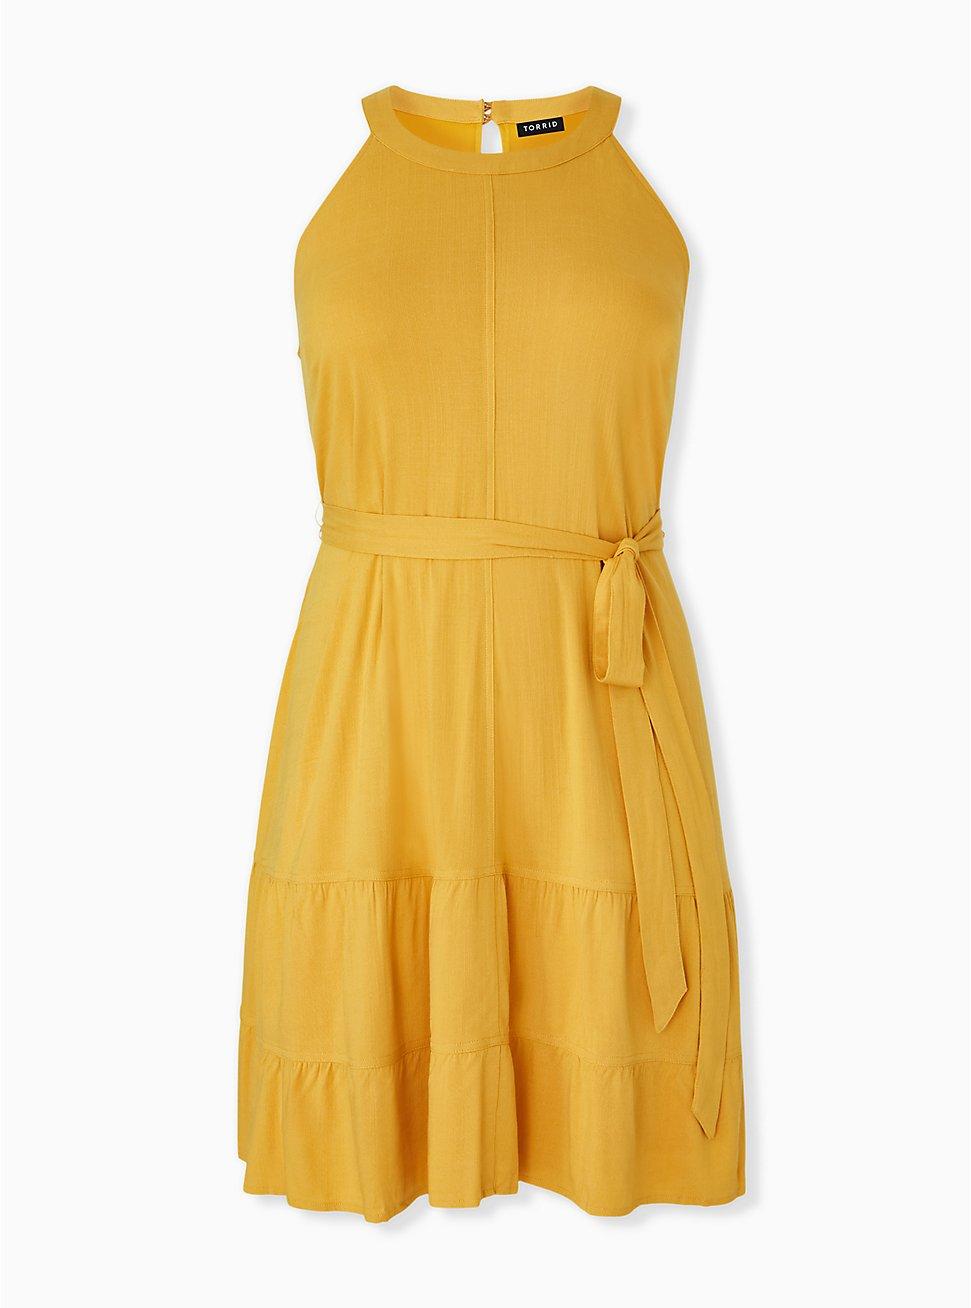 Plus Size Mustard Yellow Self Tie Tiered Dress, GOLDEN GLOW, hi-res